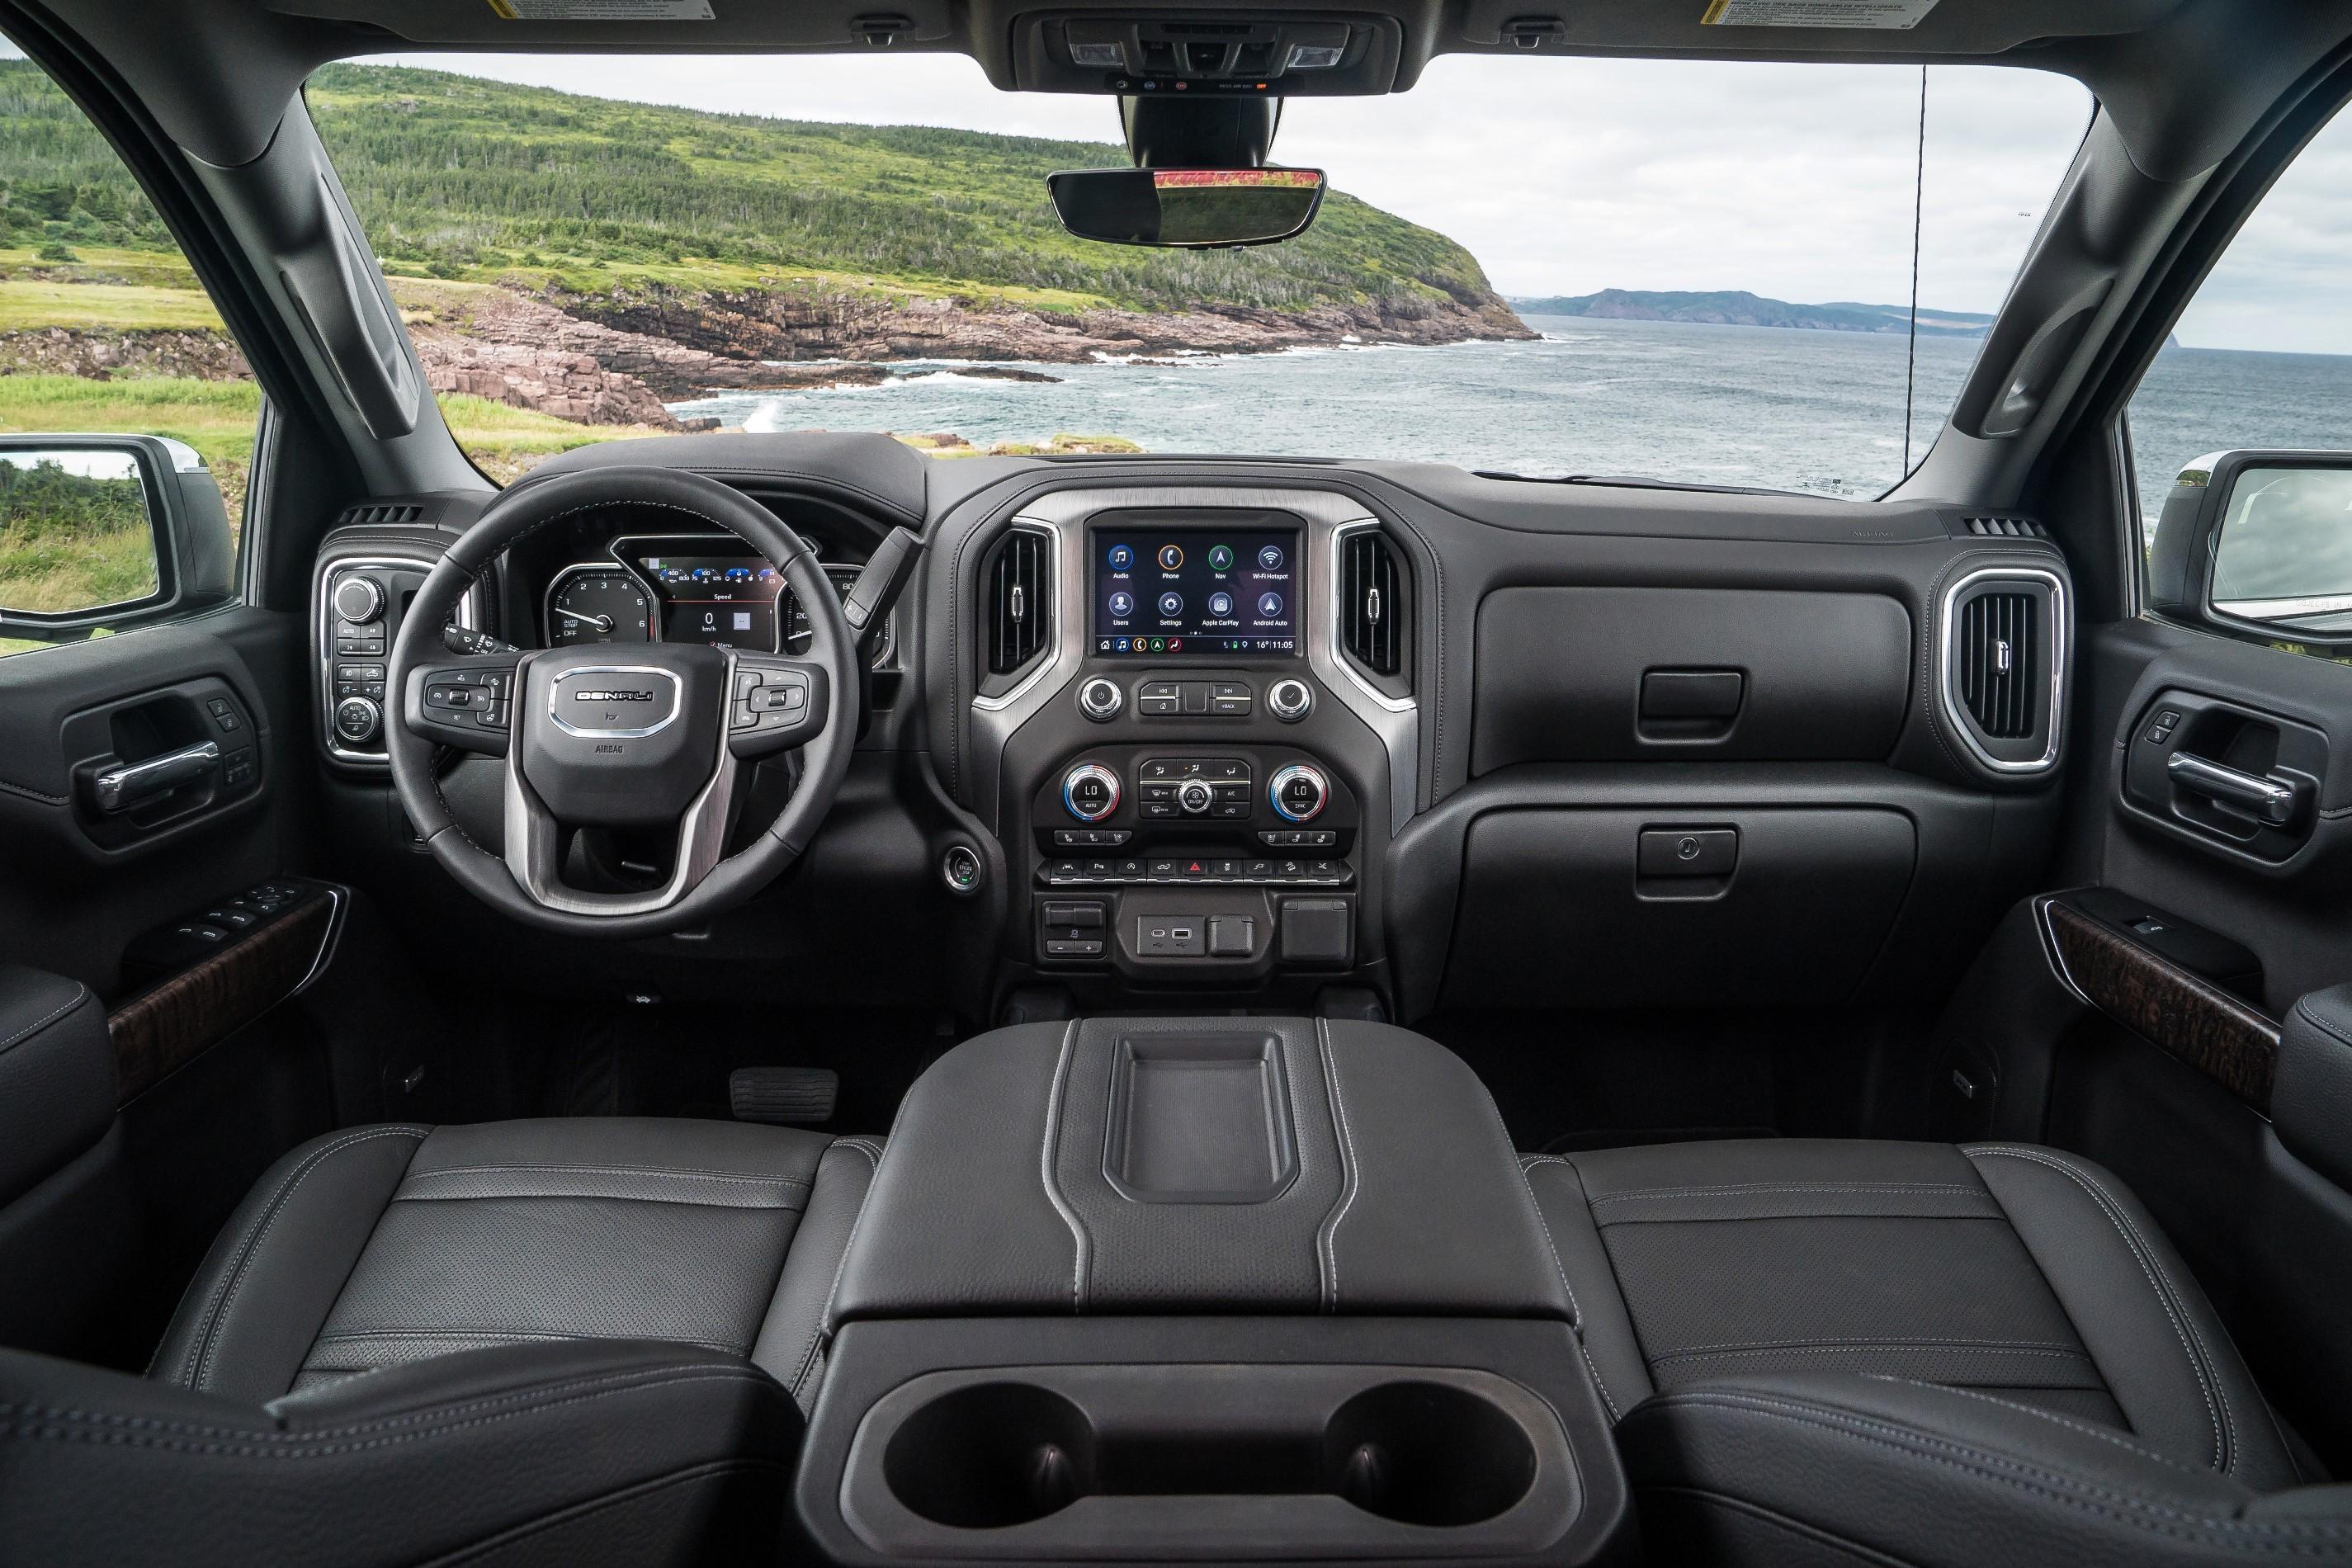 2019 GMC Sierra 1500 Denali Now Arriving at Dealers ...